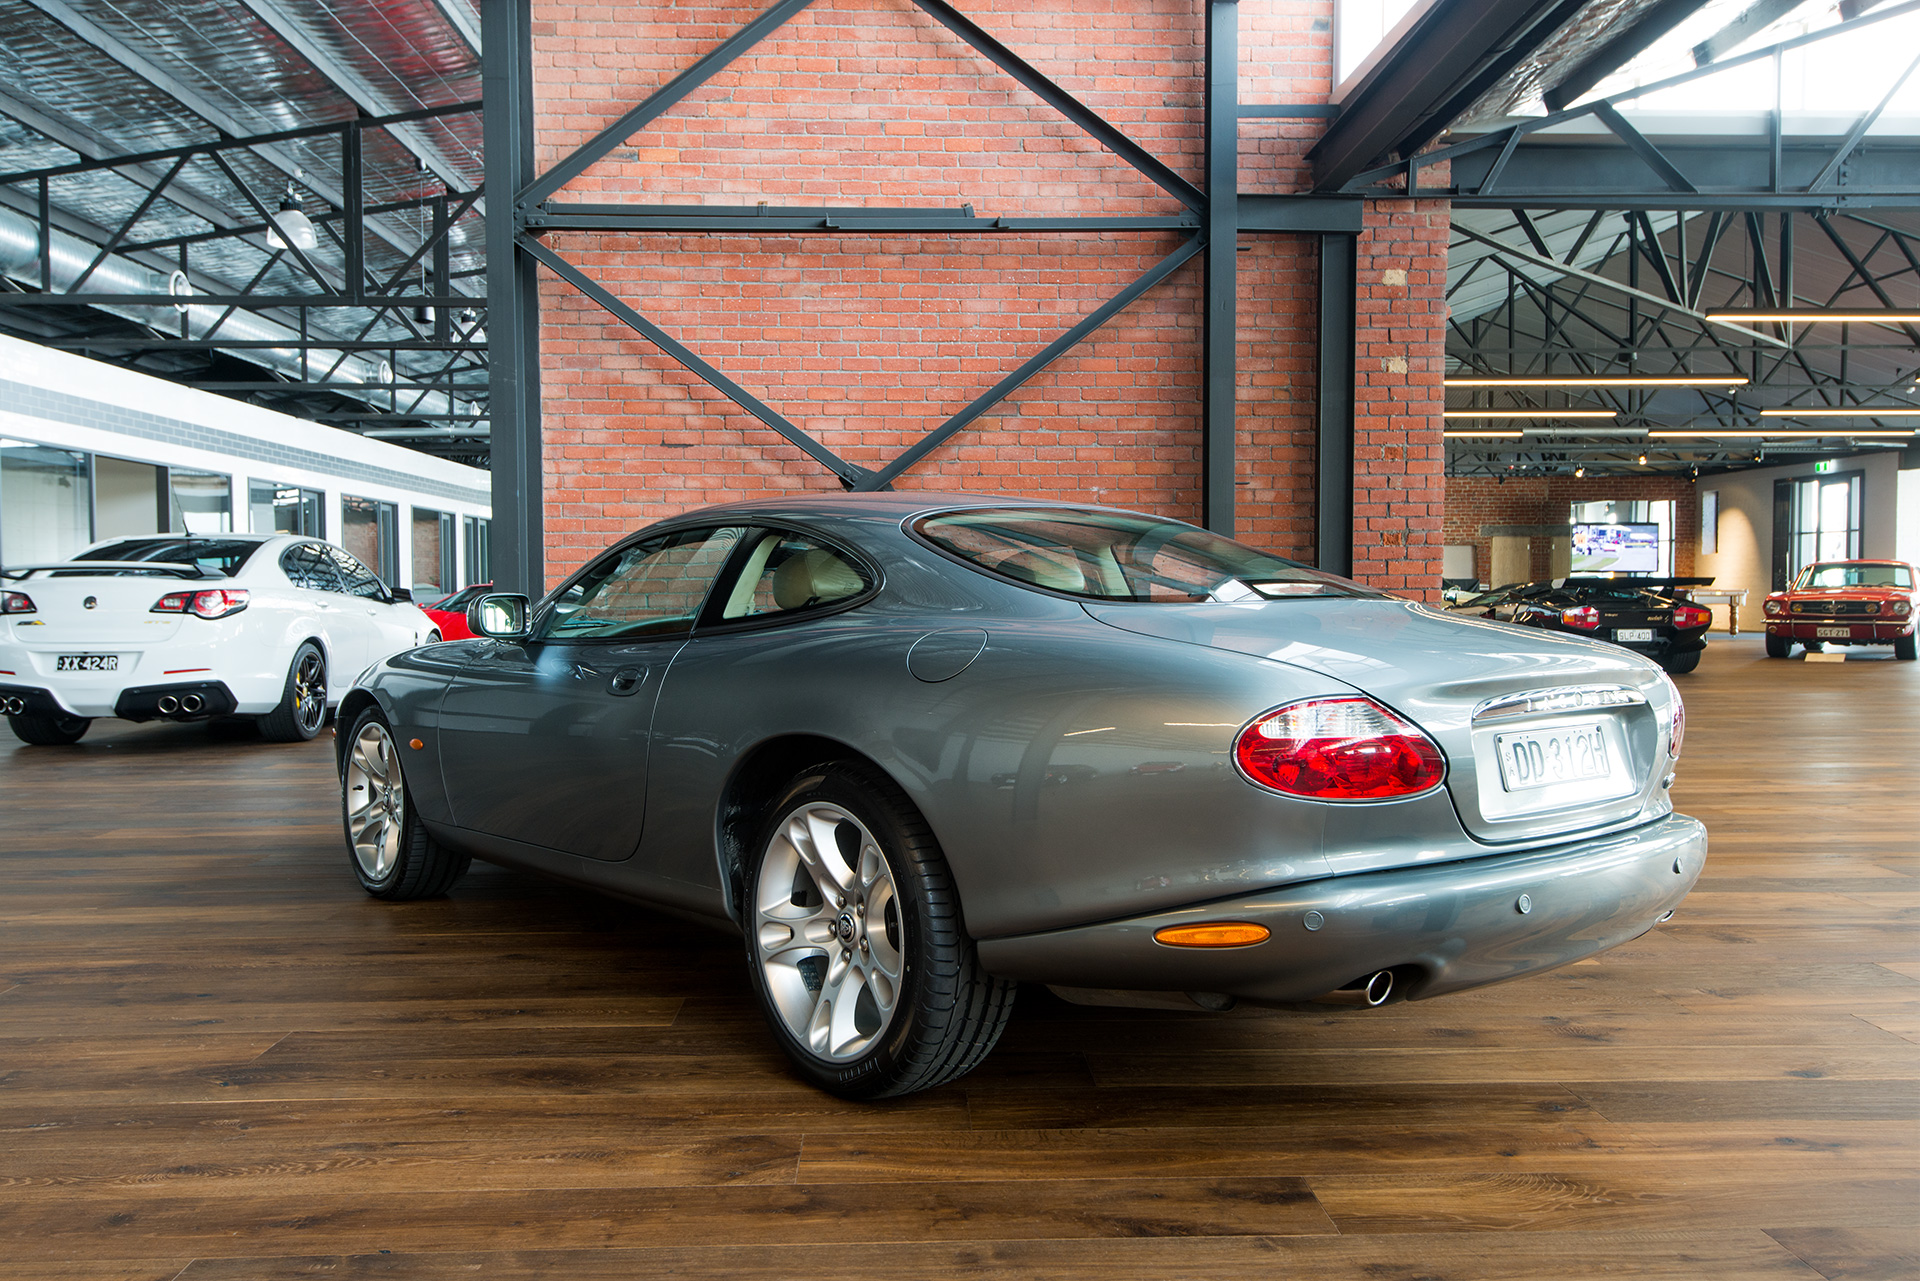 2003 jaguar xk8 coupe richmonds classic and prestige. Black Bedroom Furniture Sets. Home Design Ideas